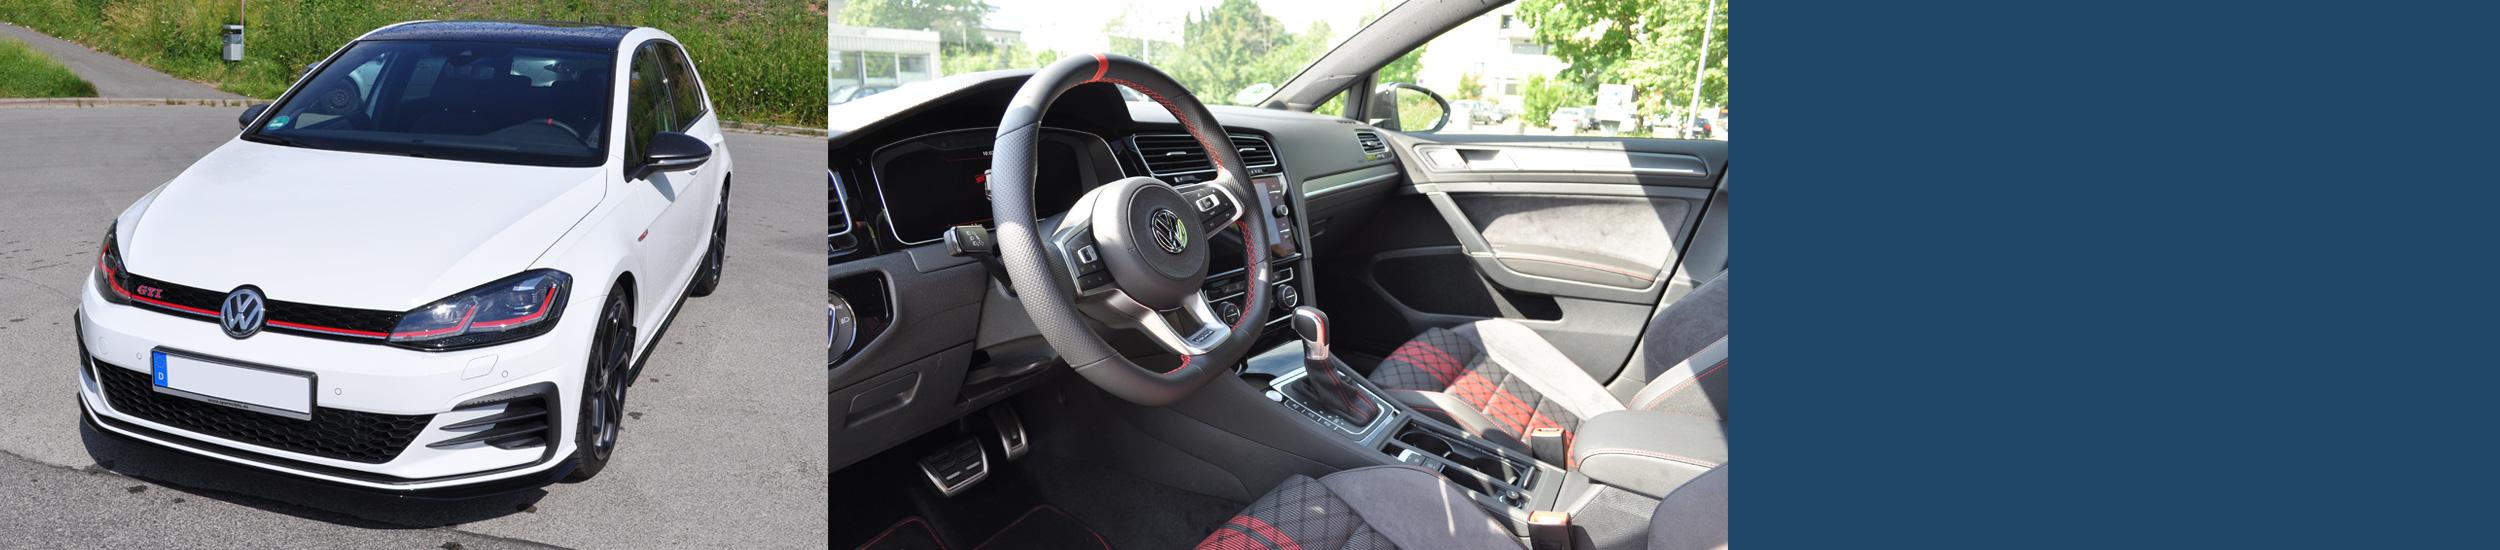 Sparmobile VW Golf GTI TCR